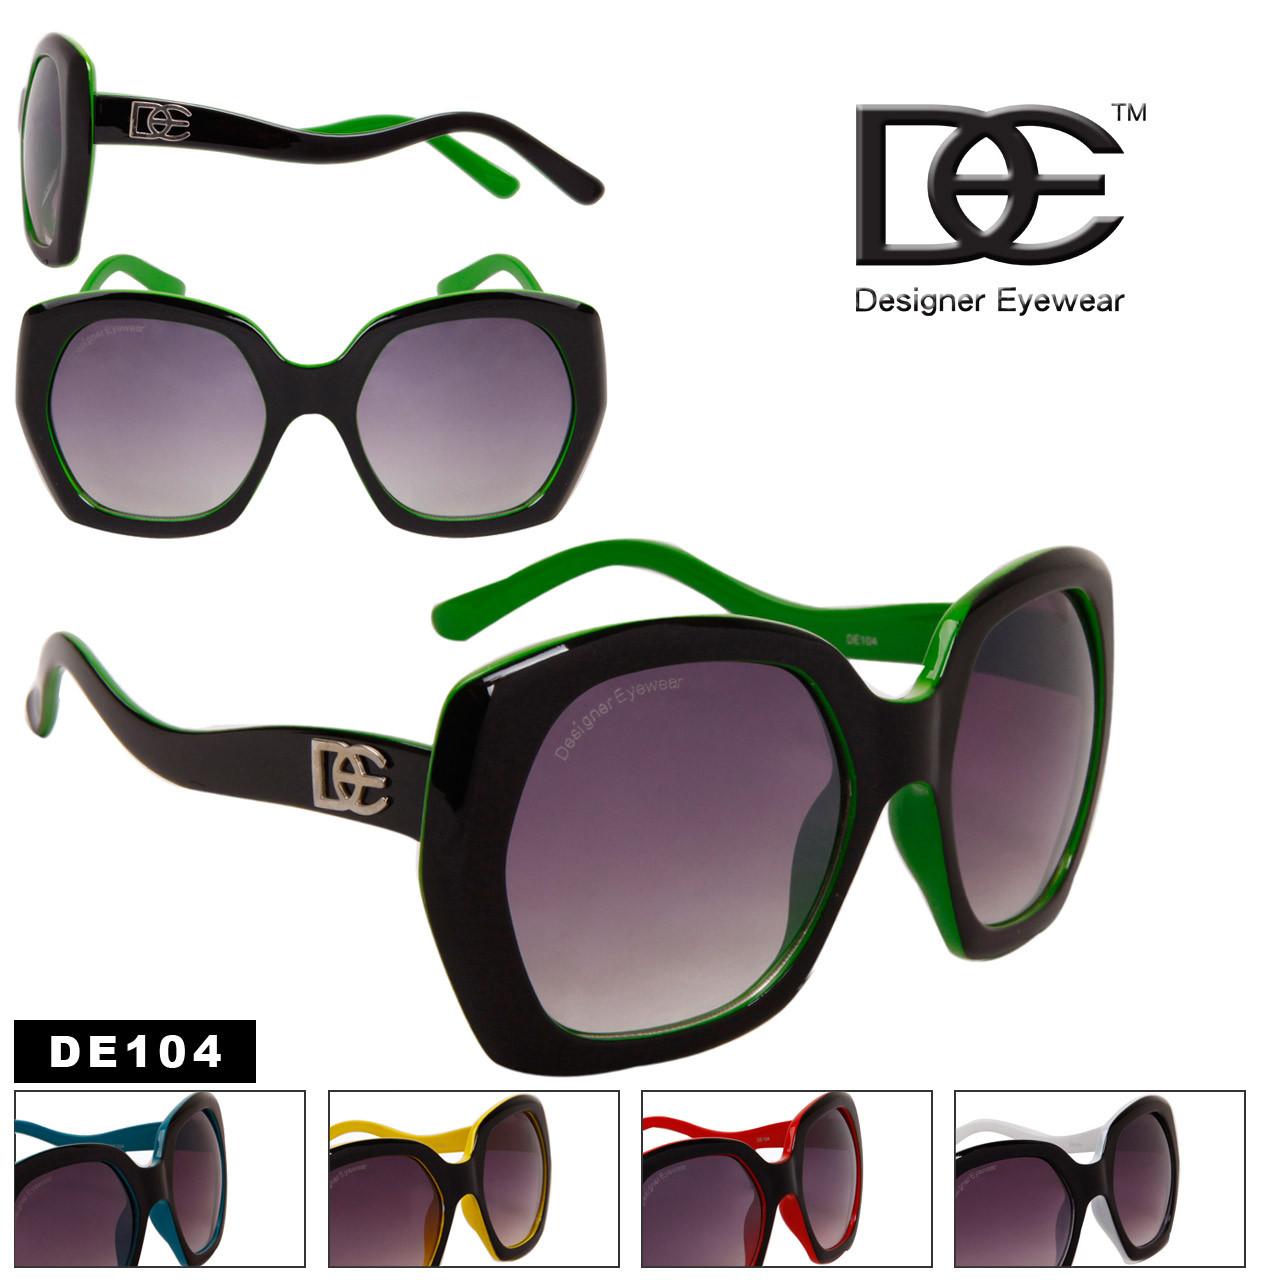 Vintage Big Lens Designer Eyewear DE104